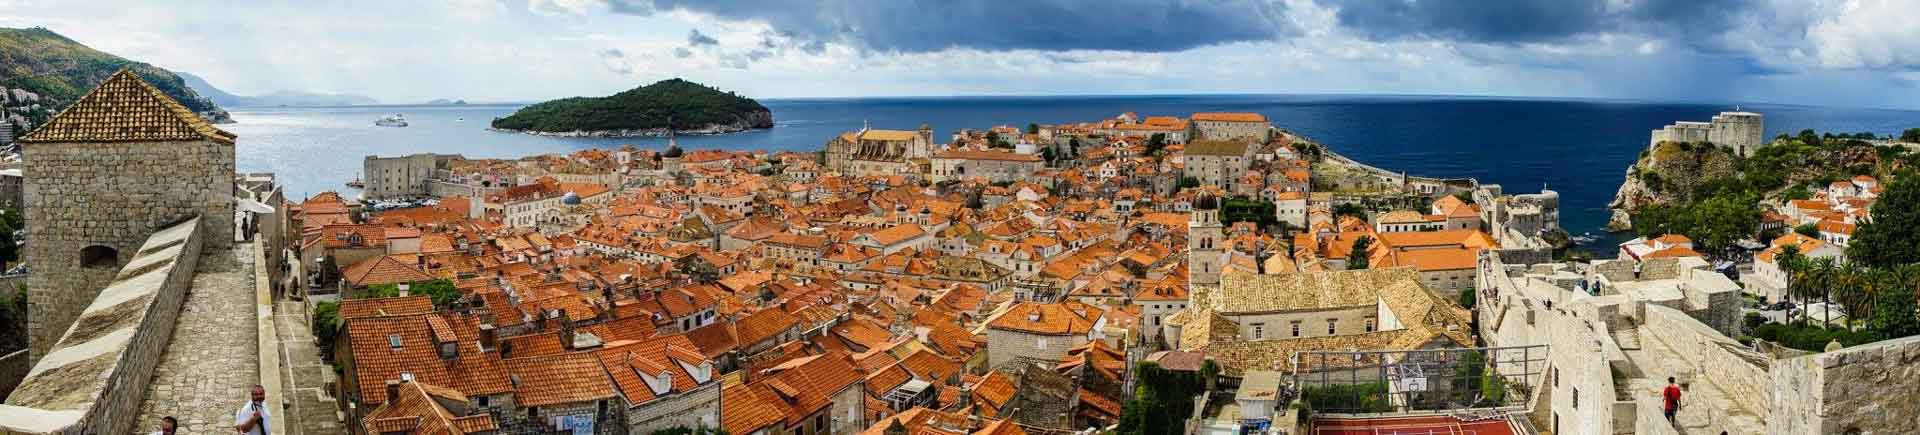 Croatia Dubrovnik City Walls tour, dubrovnik, croatia, pescart, photo blog, travel blog, blog, photo travel blog, enrico pescantini, pescantini